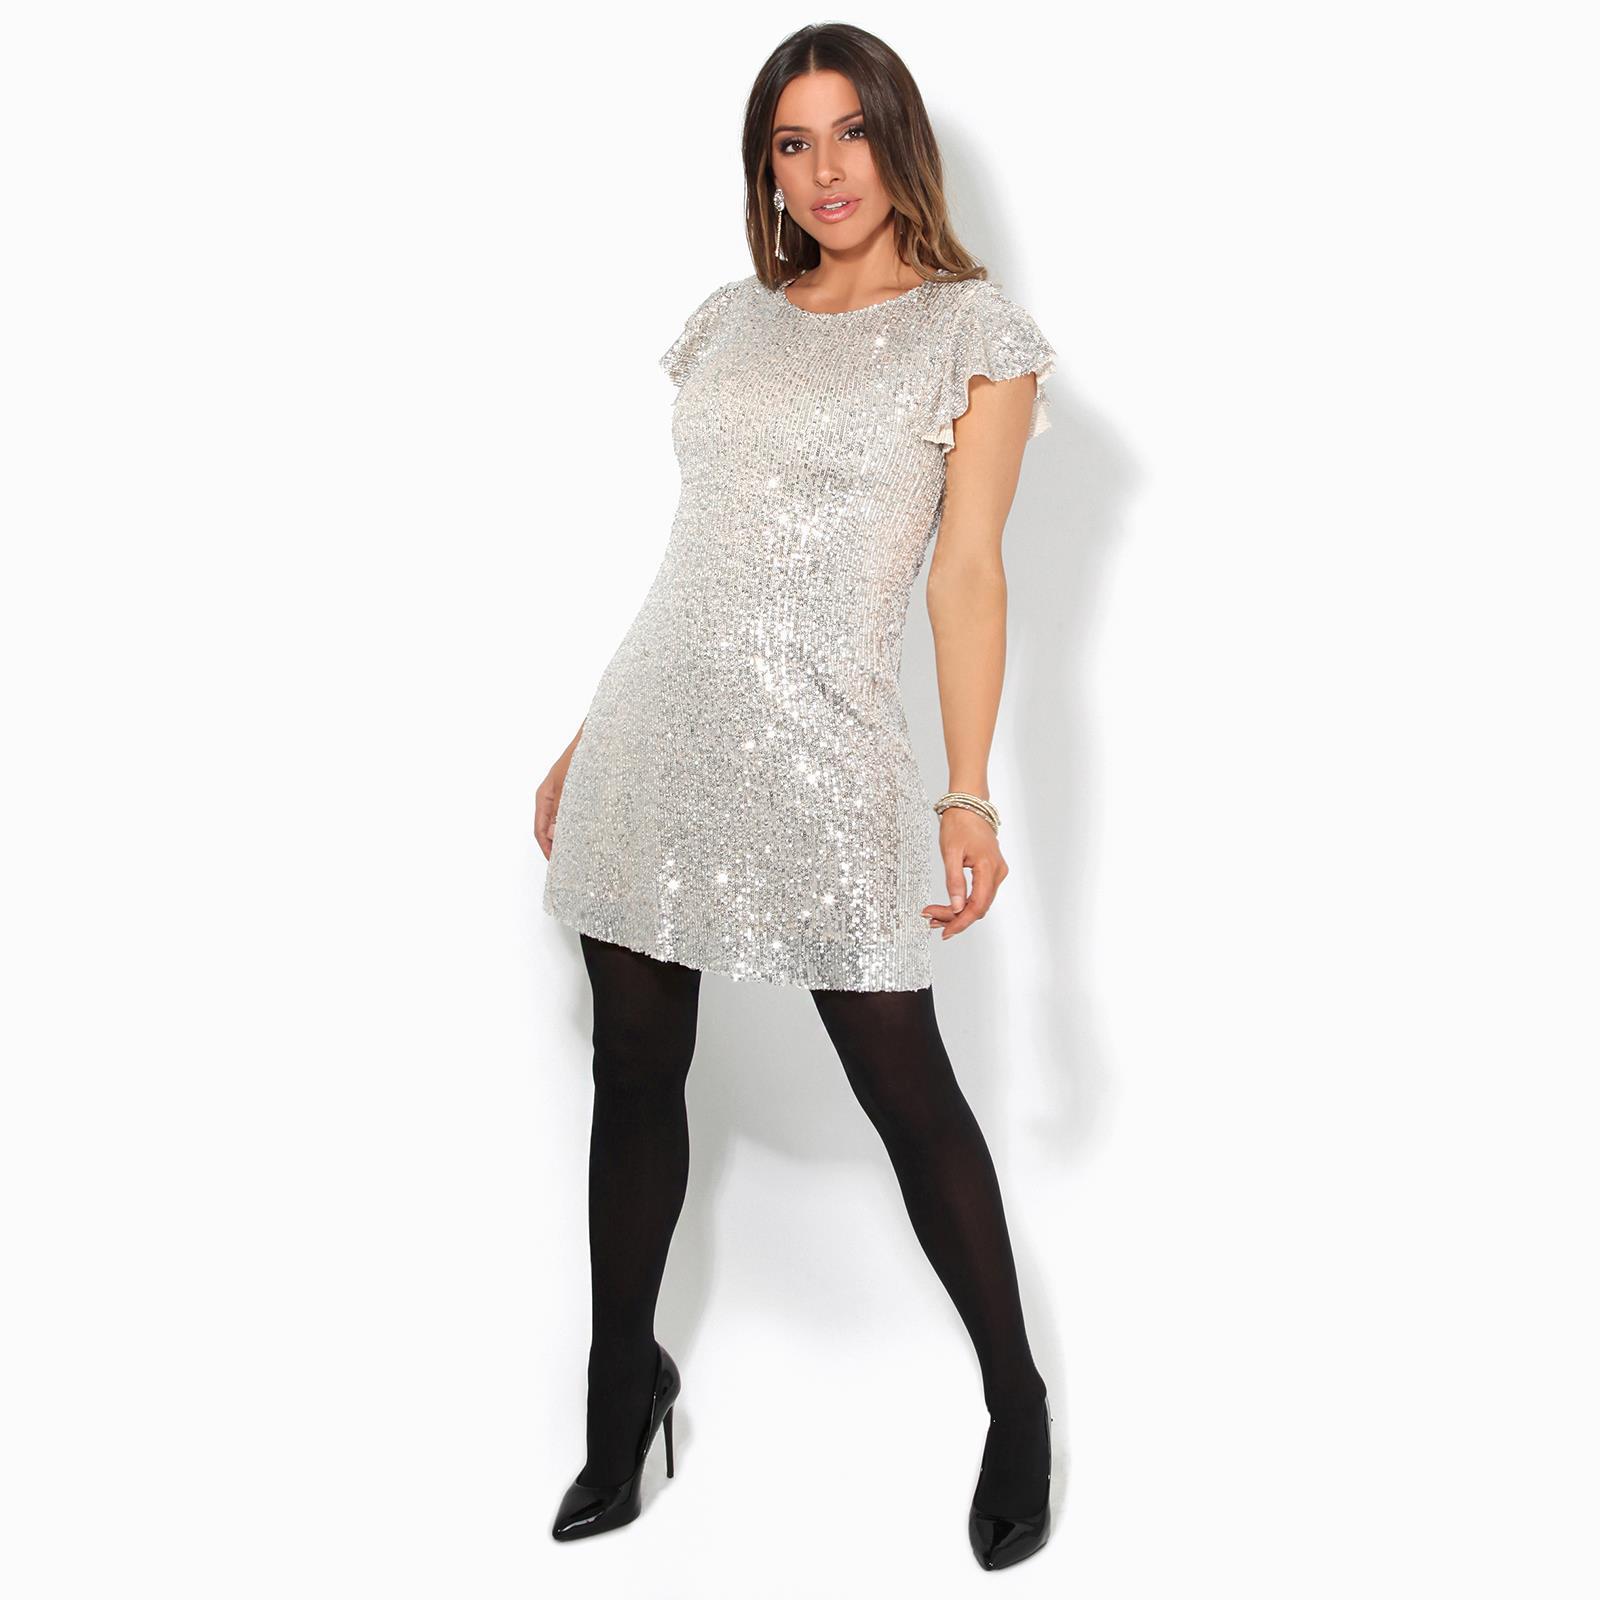 Womens-Ladies-Sequin-Glitter-Dress-Party-Ruffle-Sleeve-Evening-Lurex-Tunic-Top thumbnail 6